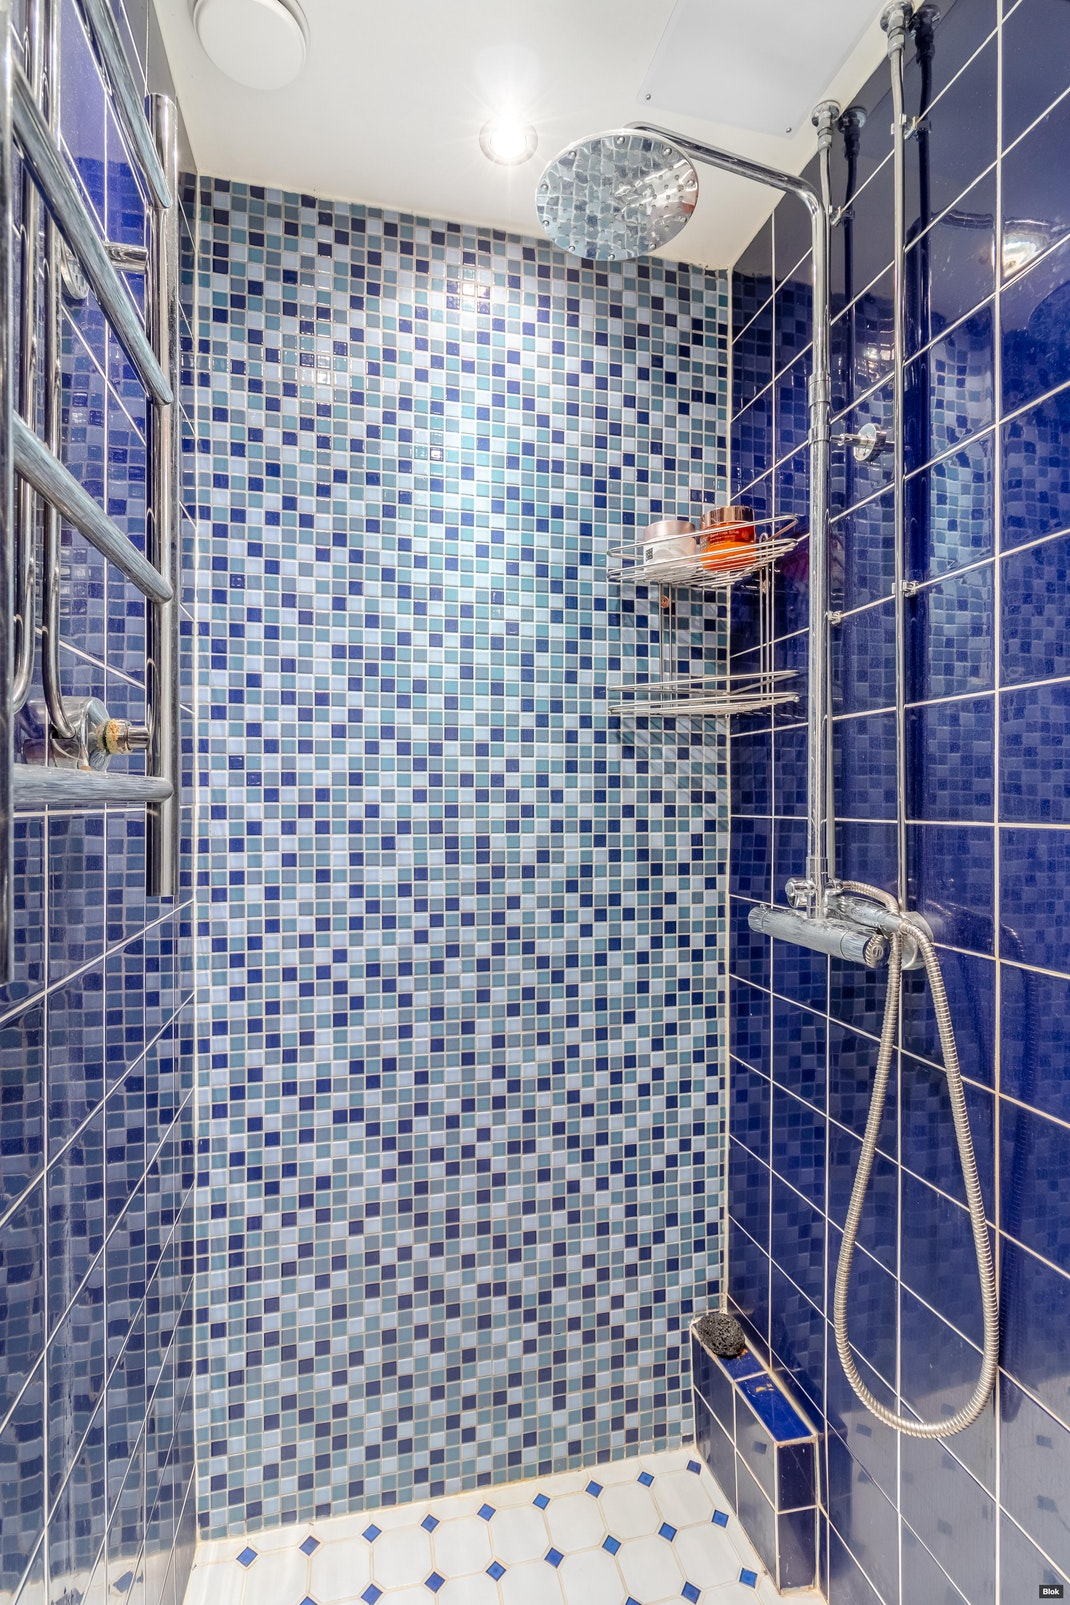 Siltasaarenkatu 15 A 12 Kylpyhuone & Erillinen WC